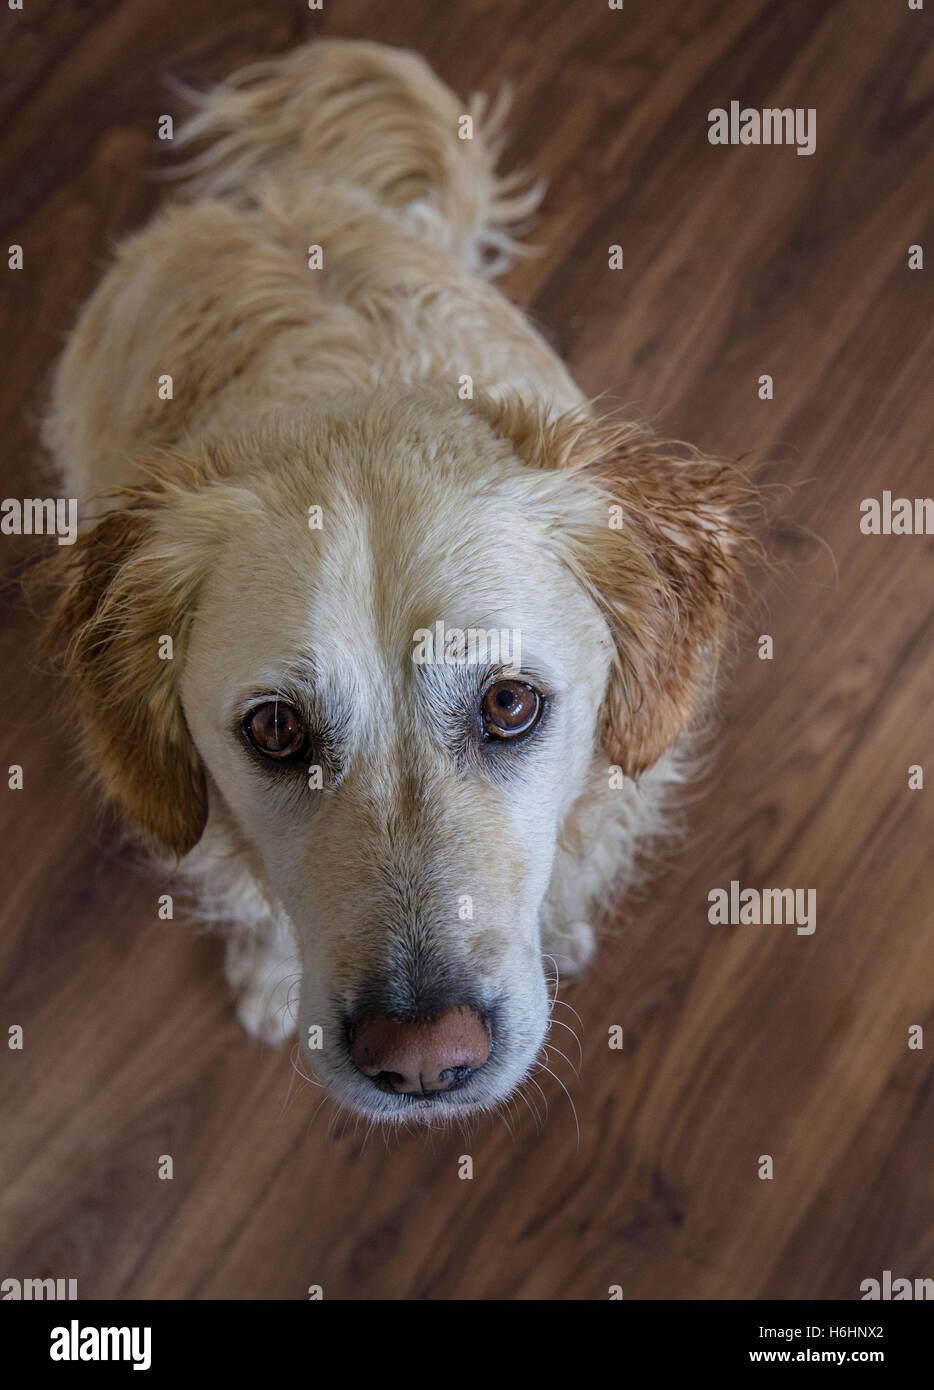 dog looking up longingly with loving eyes - Stock Image